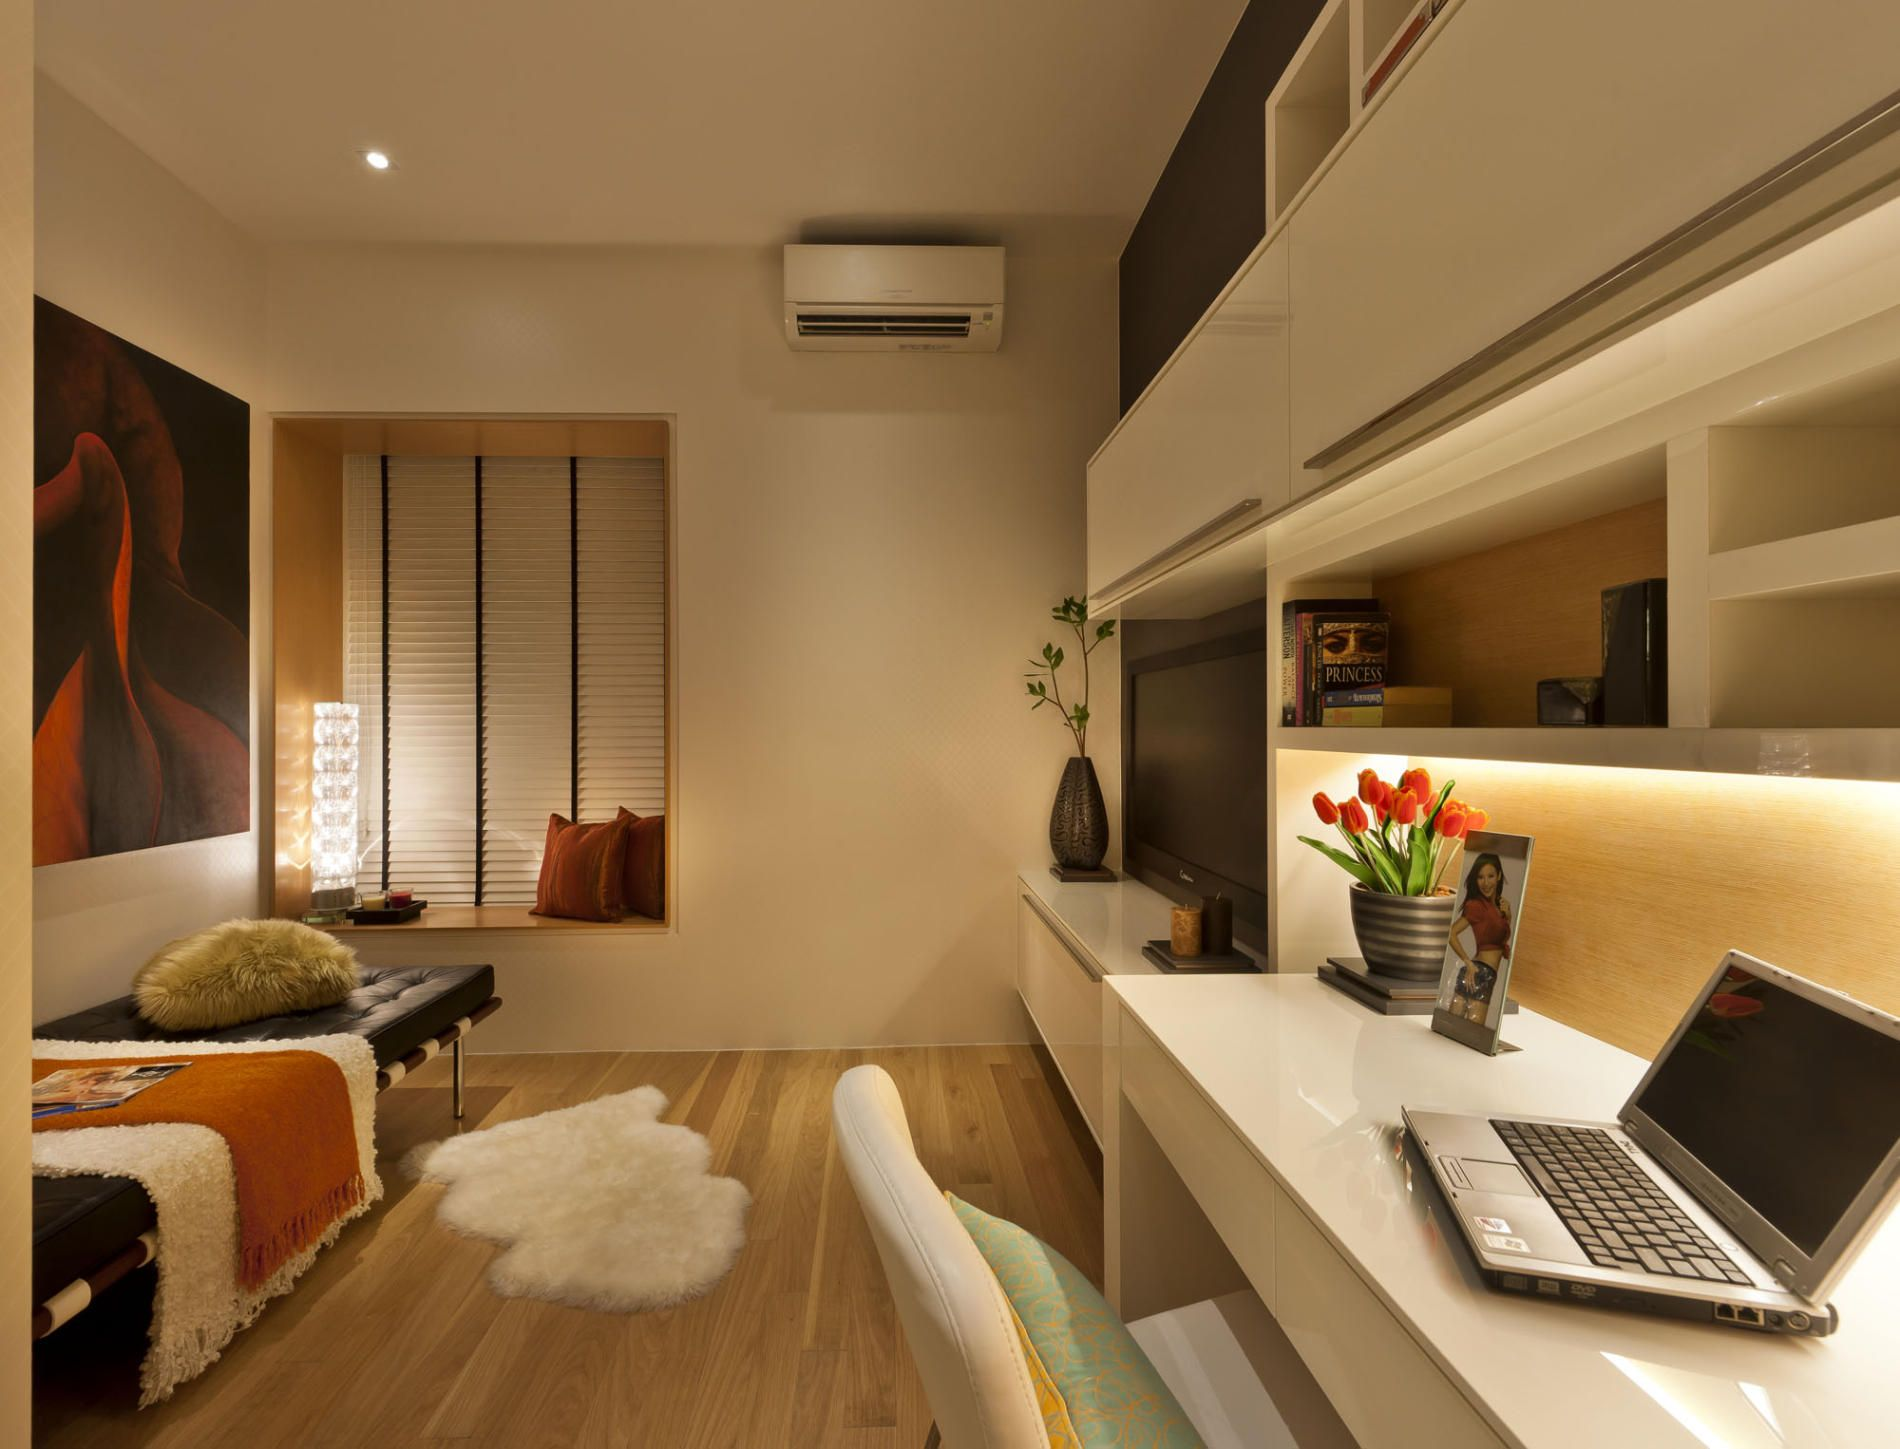 room - Modern Study Room Interior Design